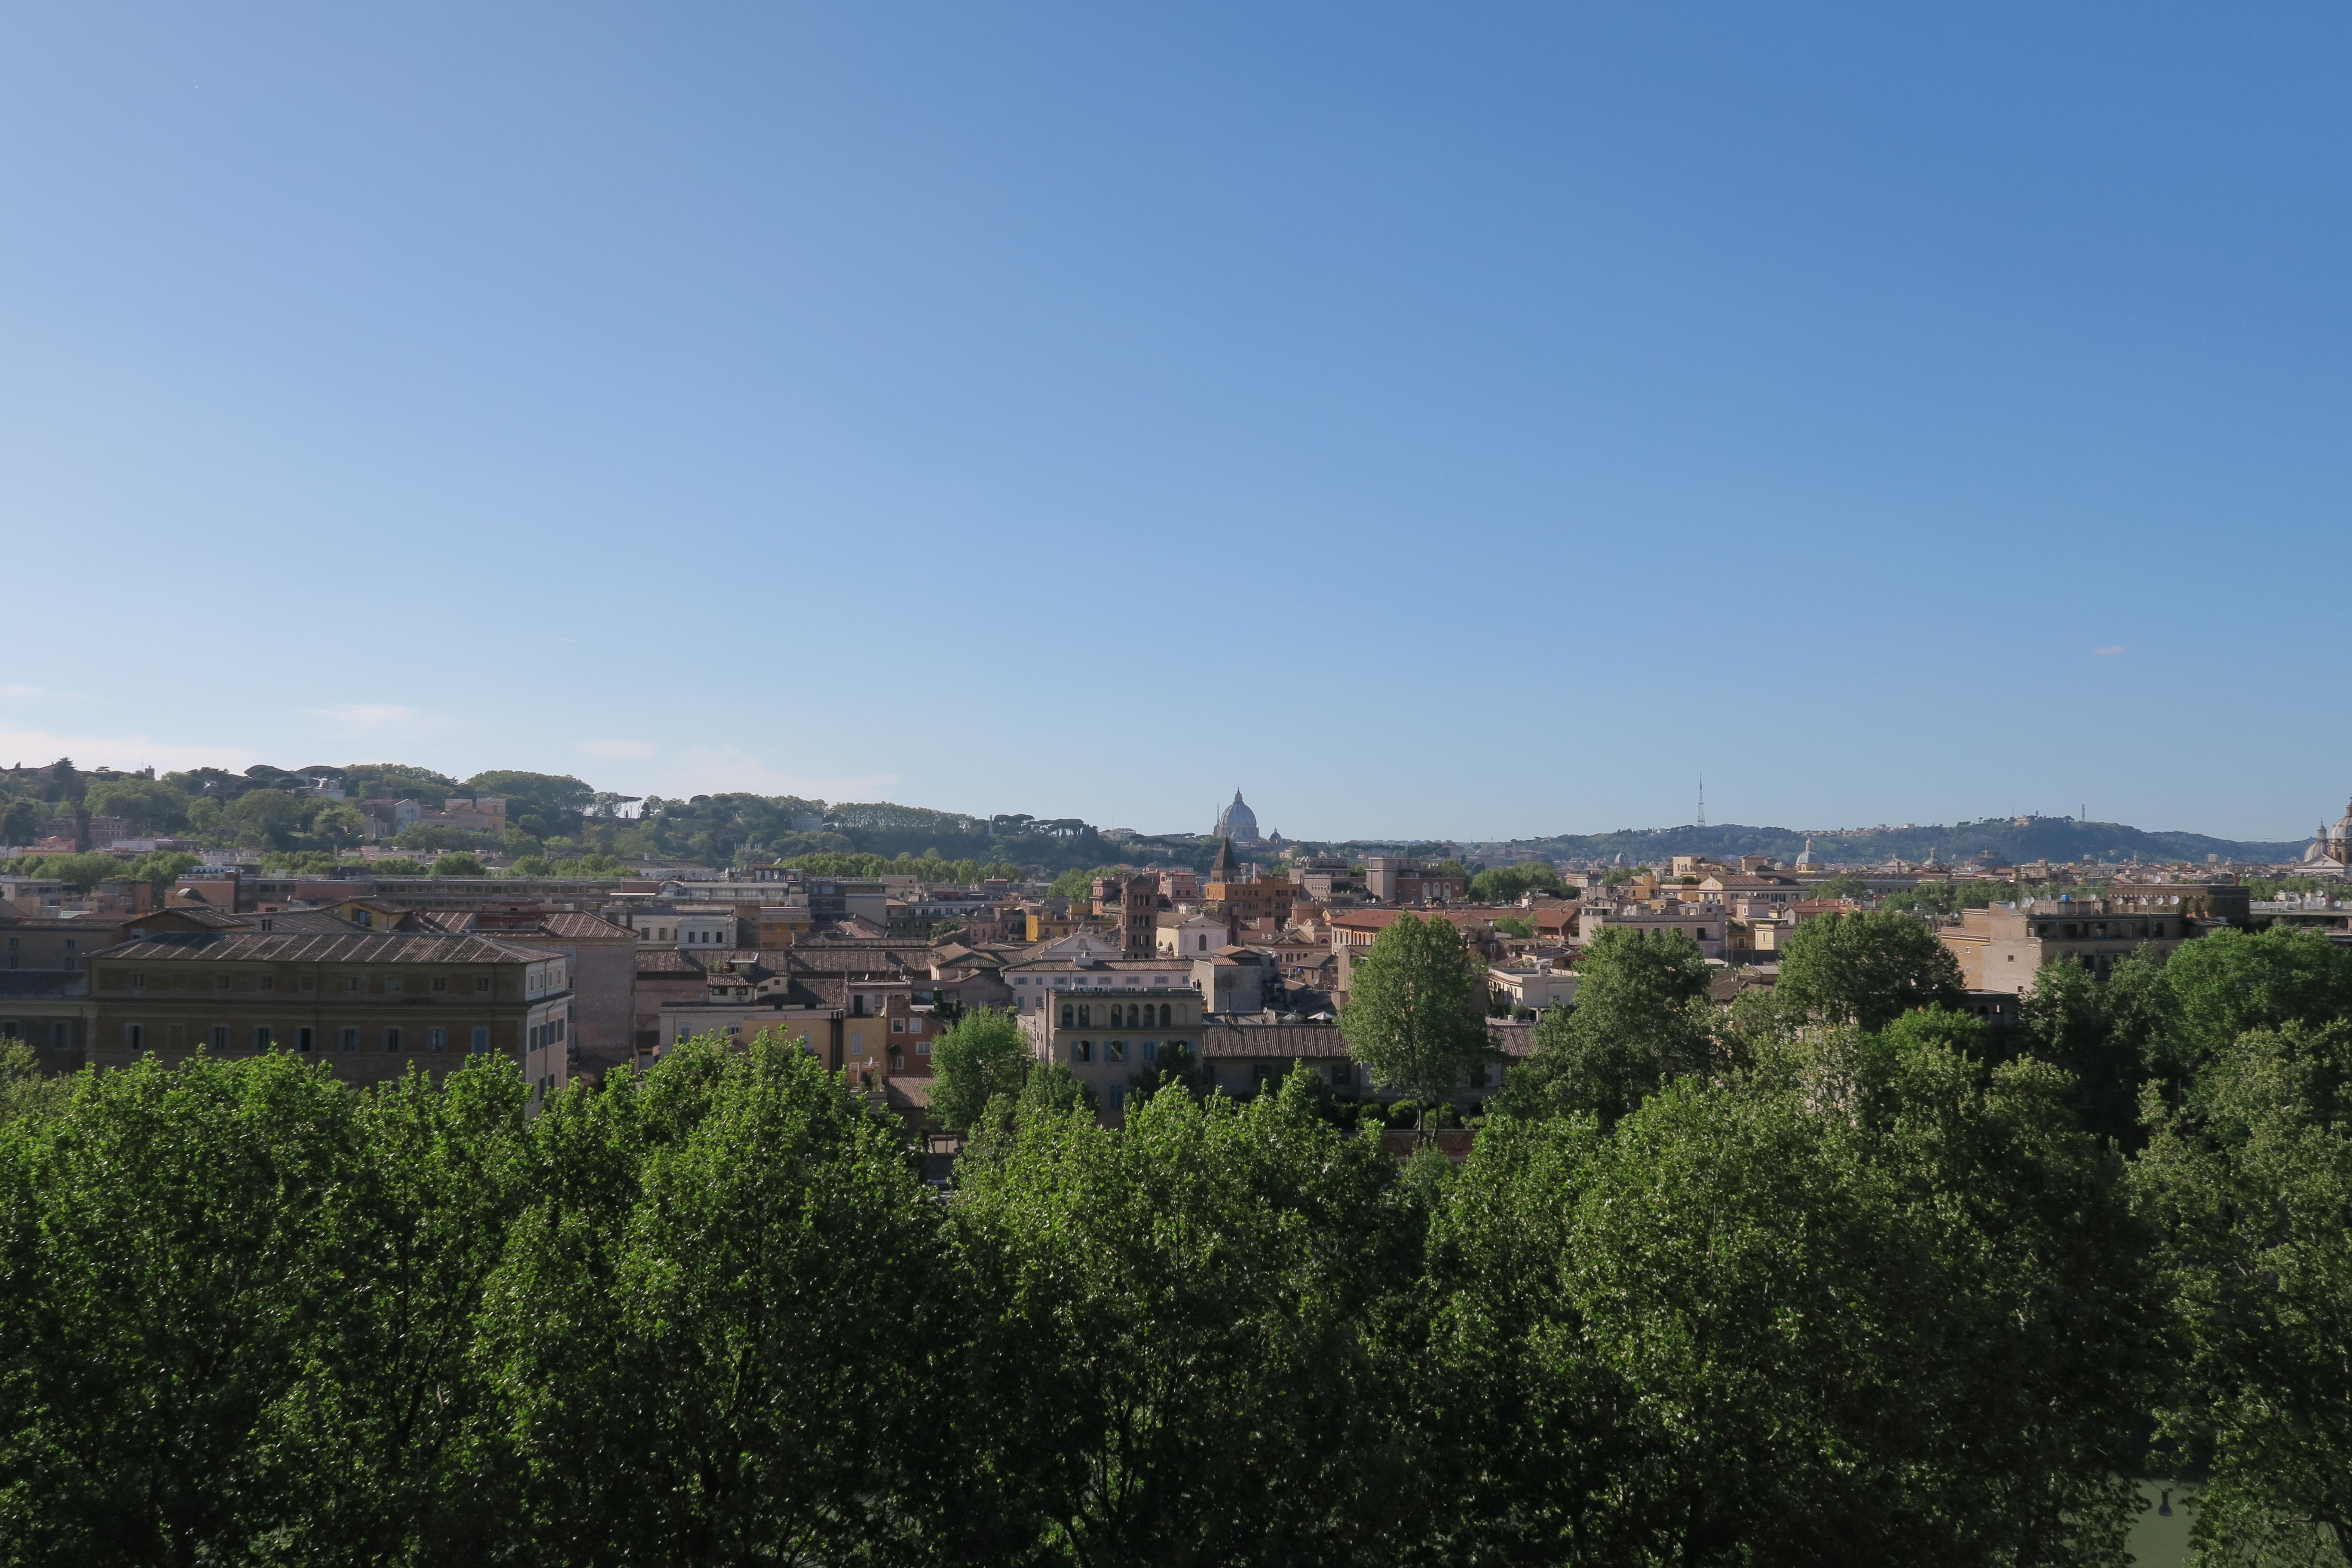 SheHearts Rome